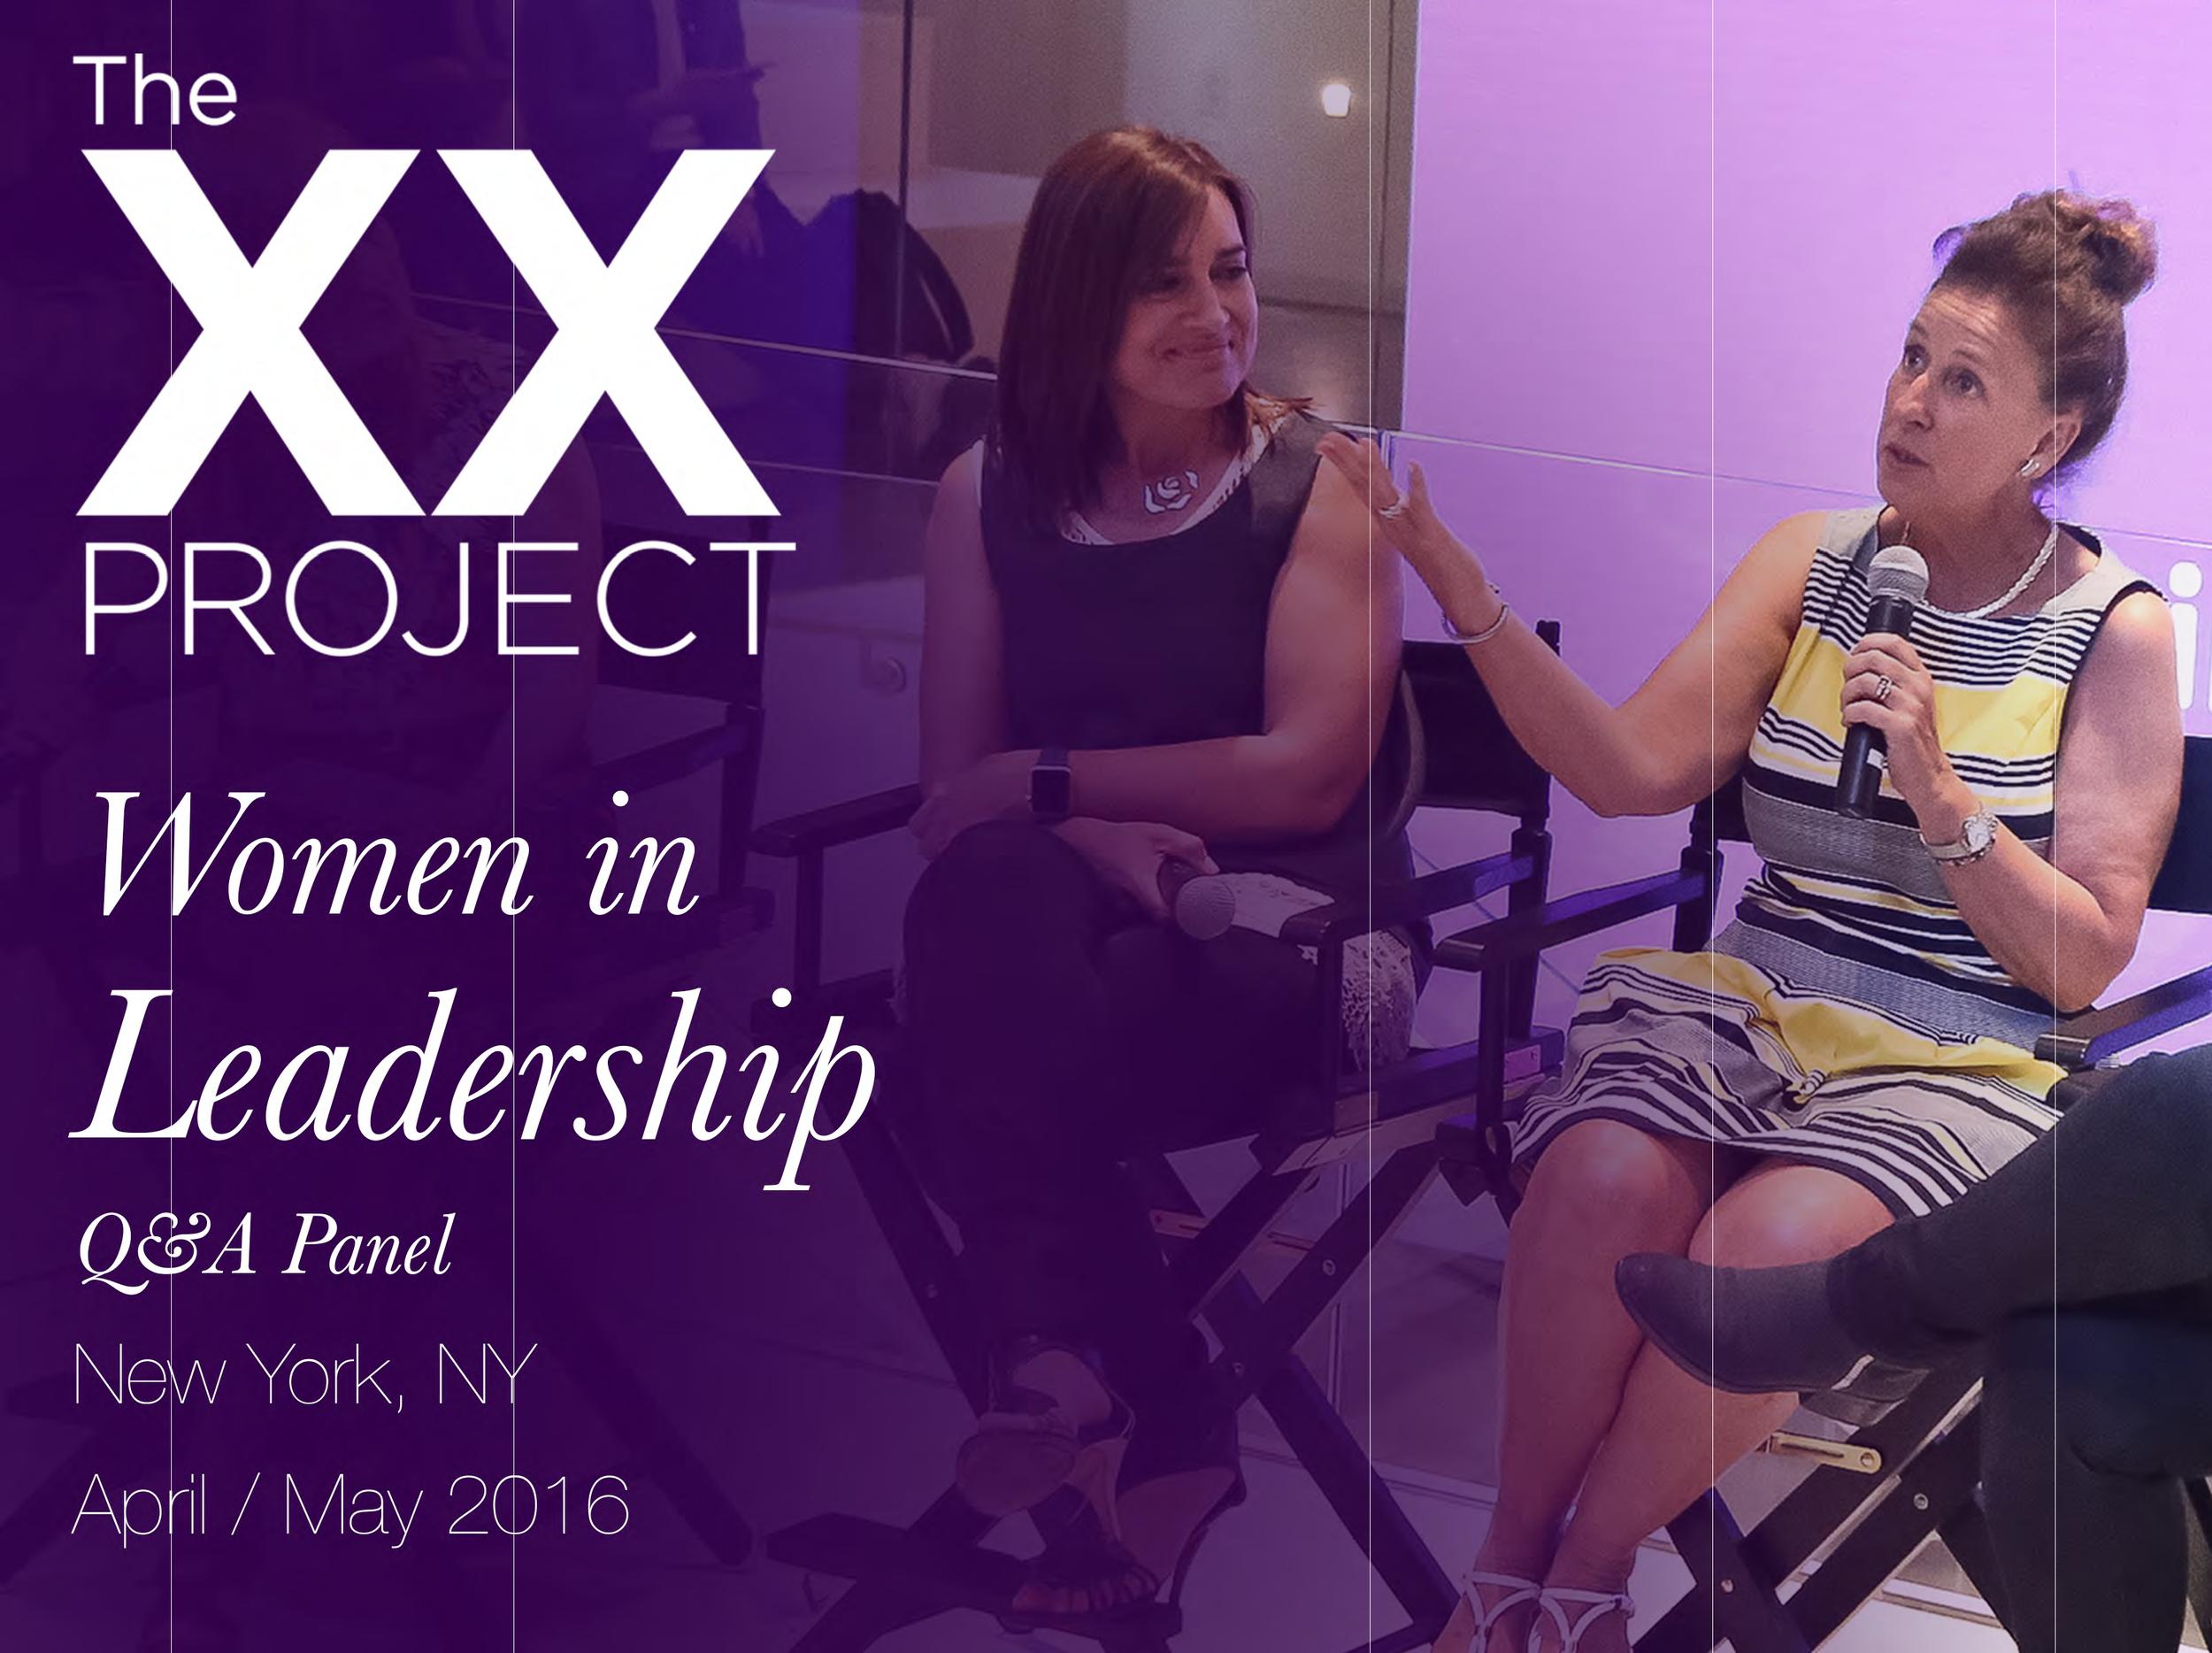 Women in Leadership Q&A Panel